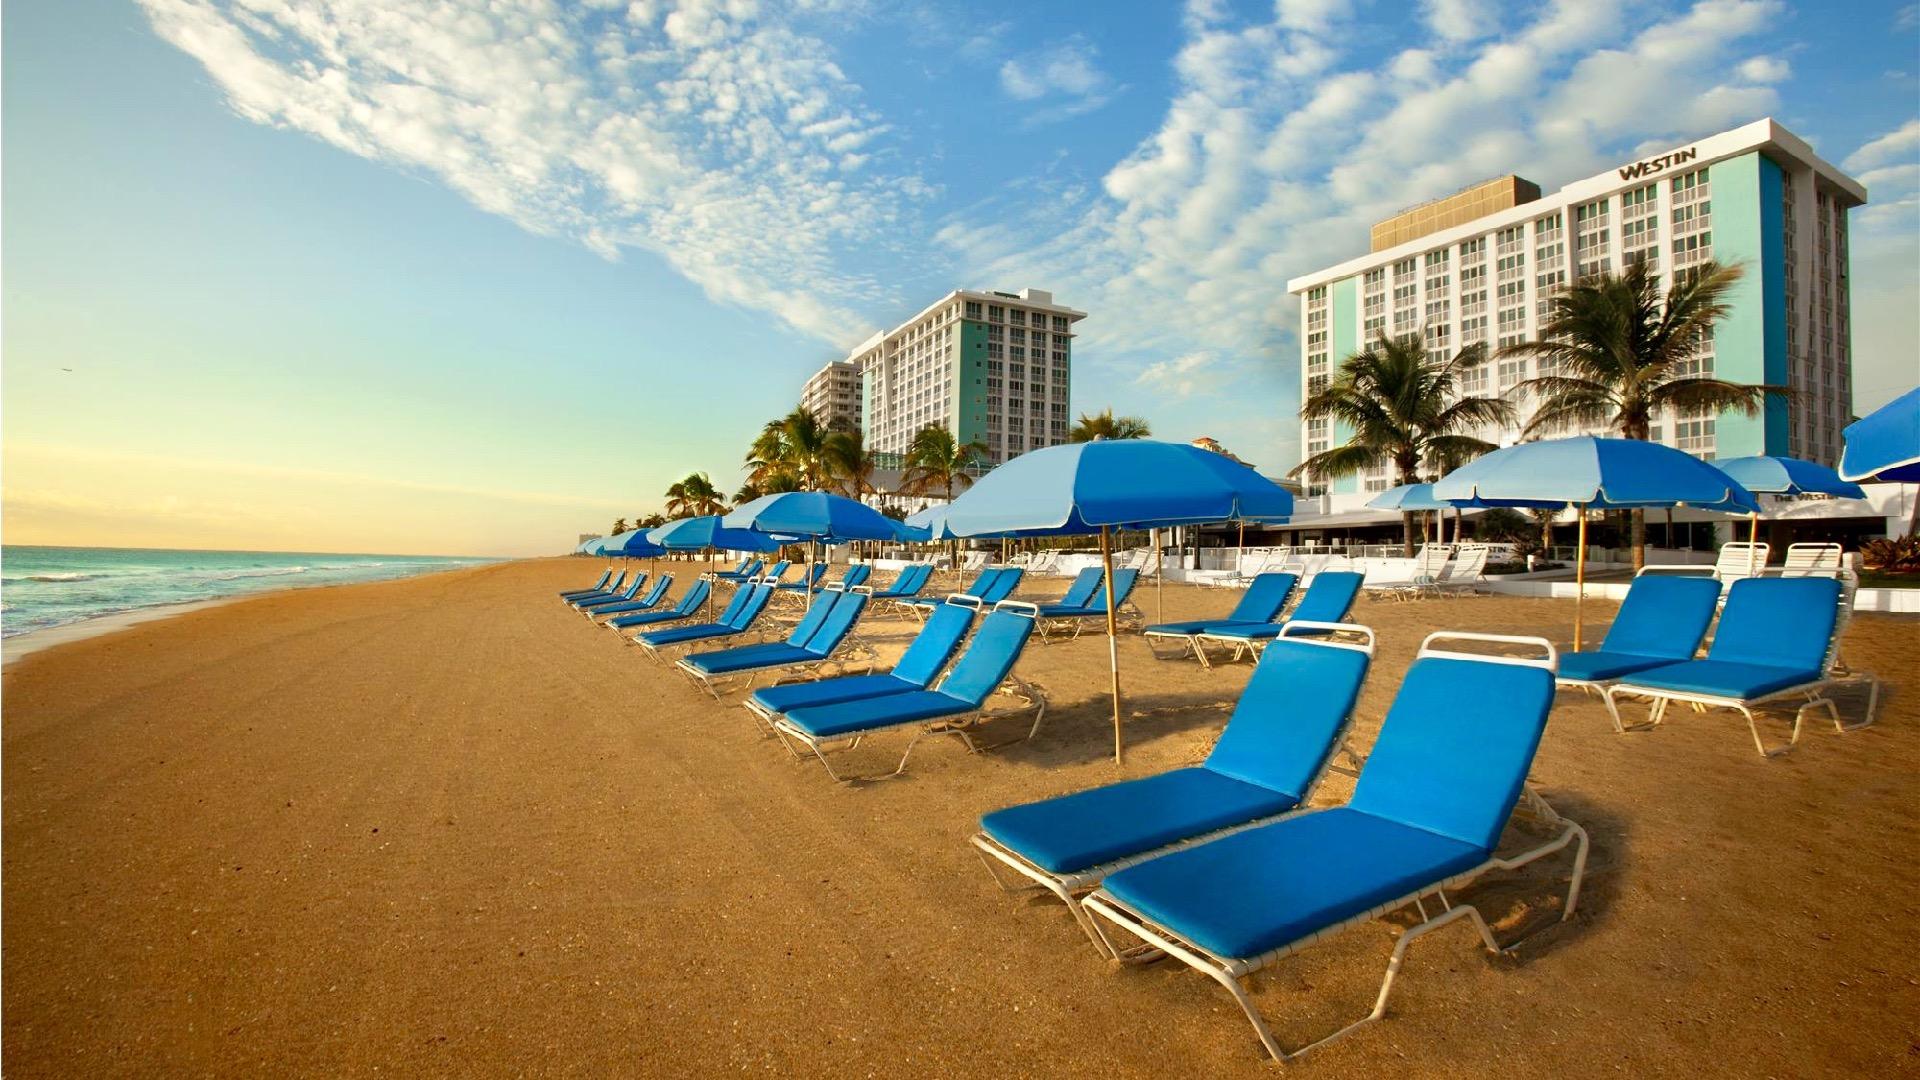 Westin Fort Lauderdale Beach Resort Address